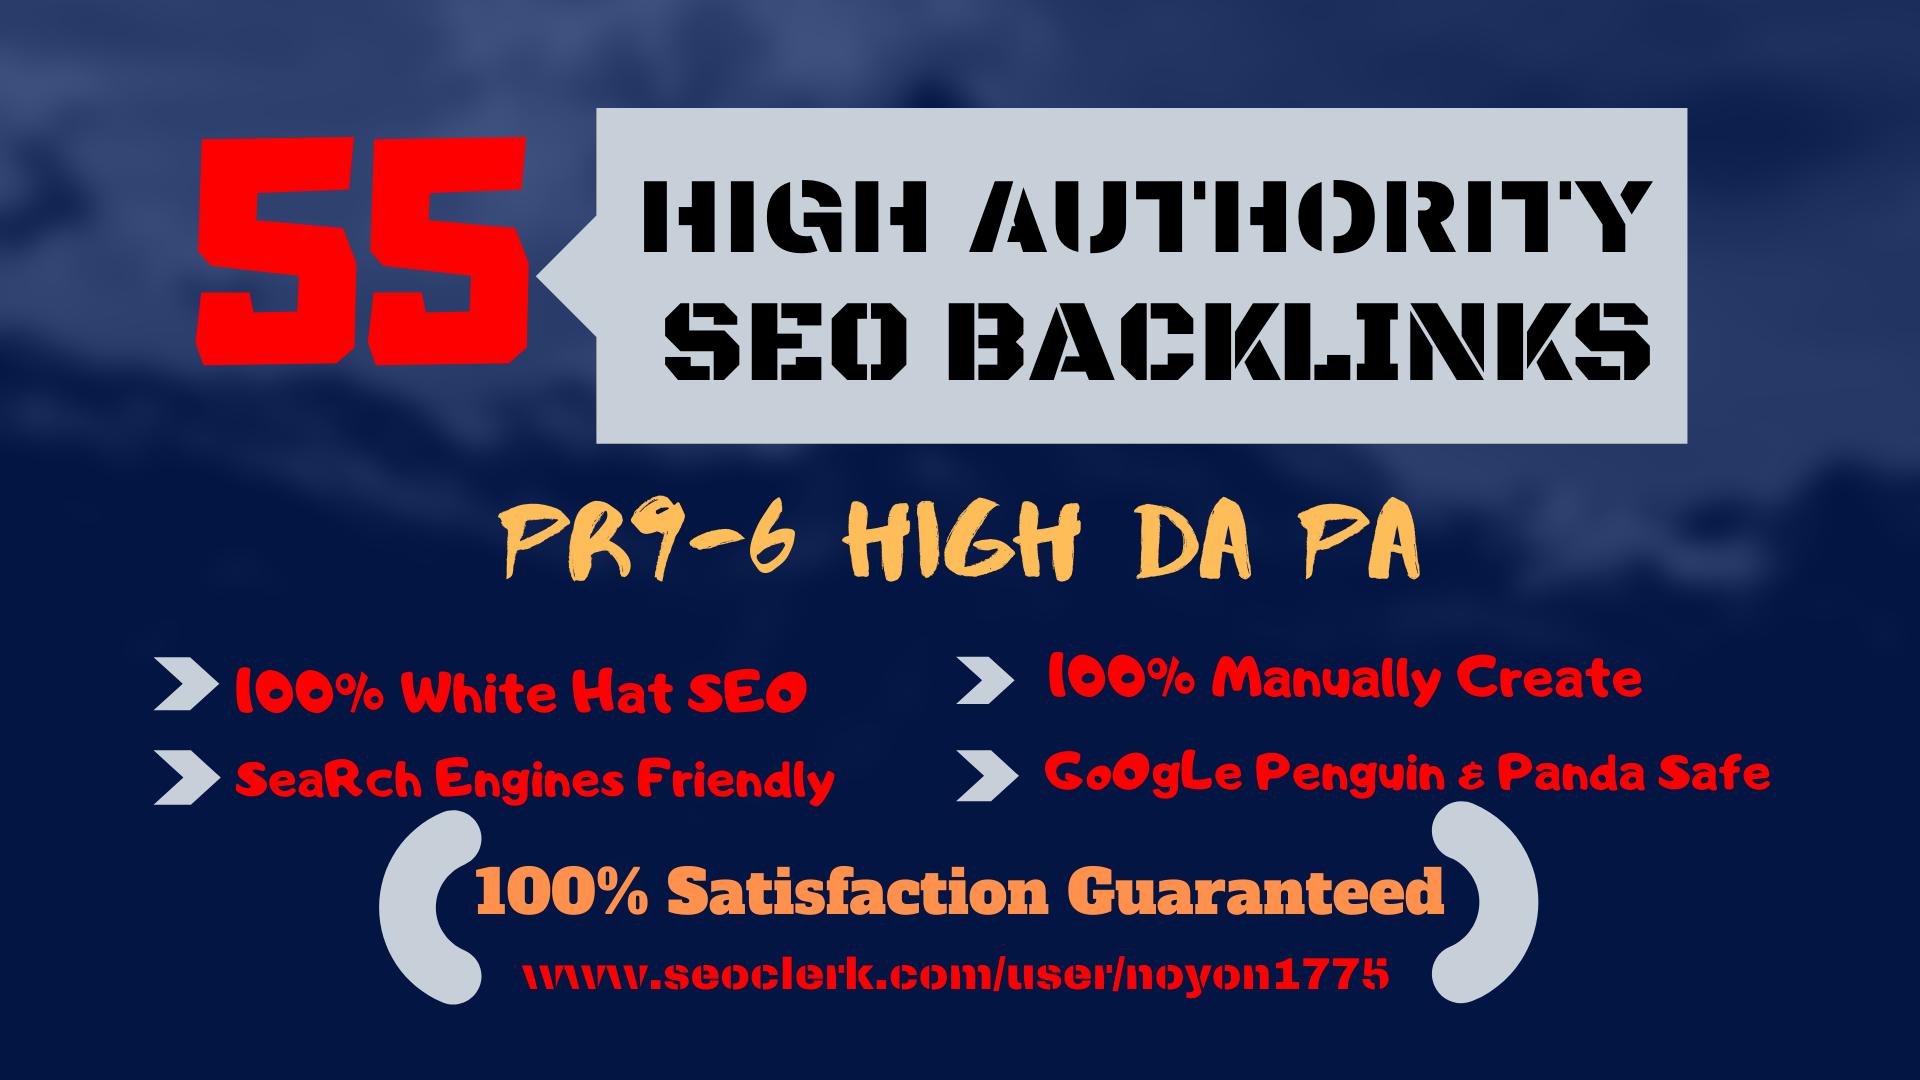 build high quality whitehat SEO backlinks